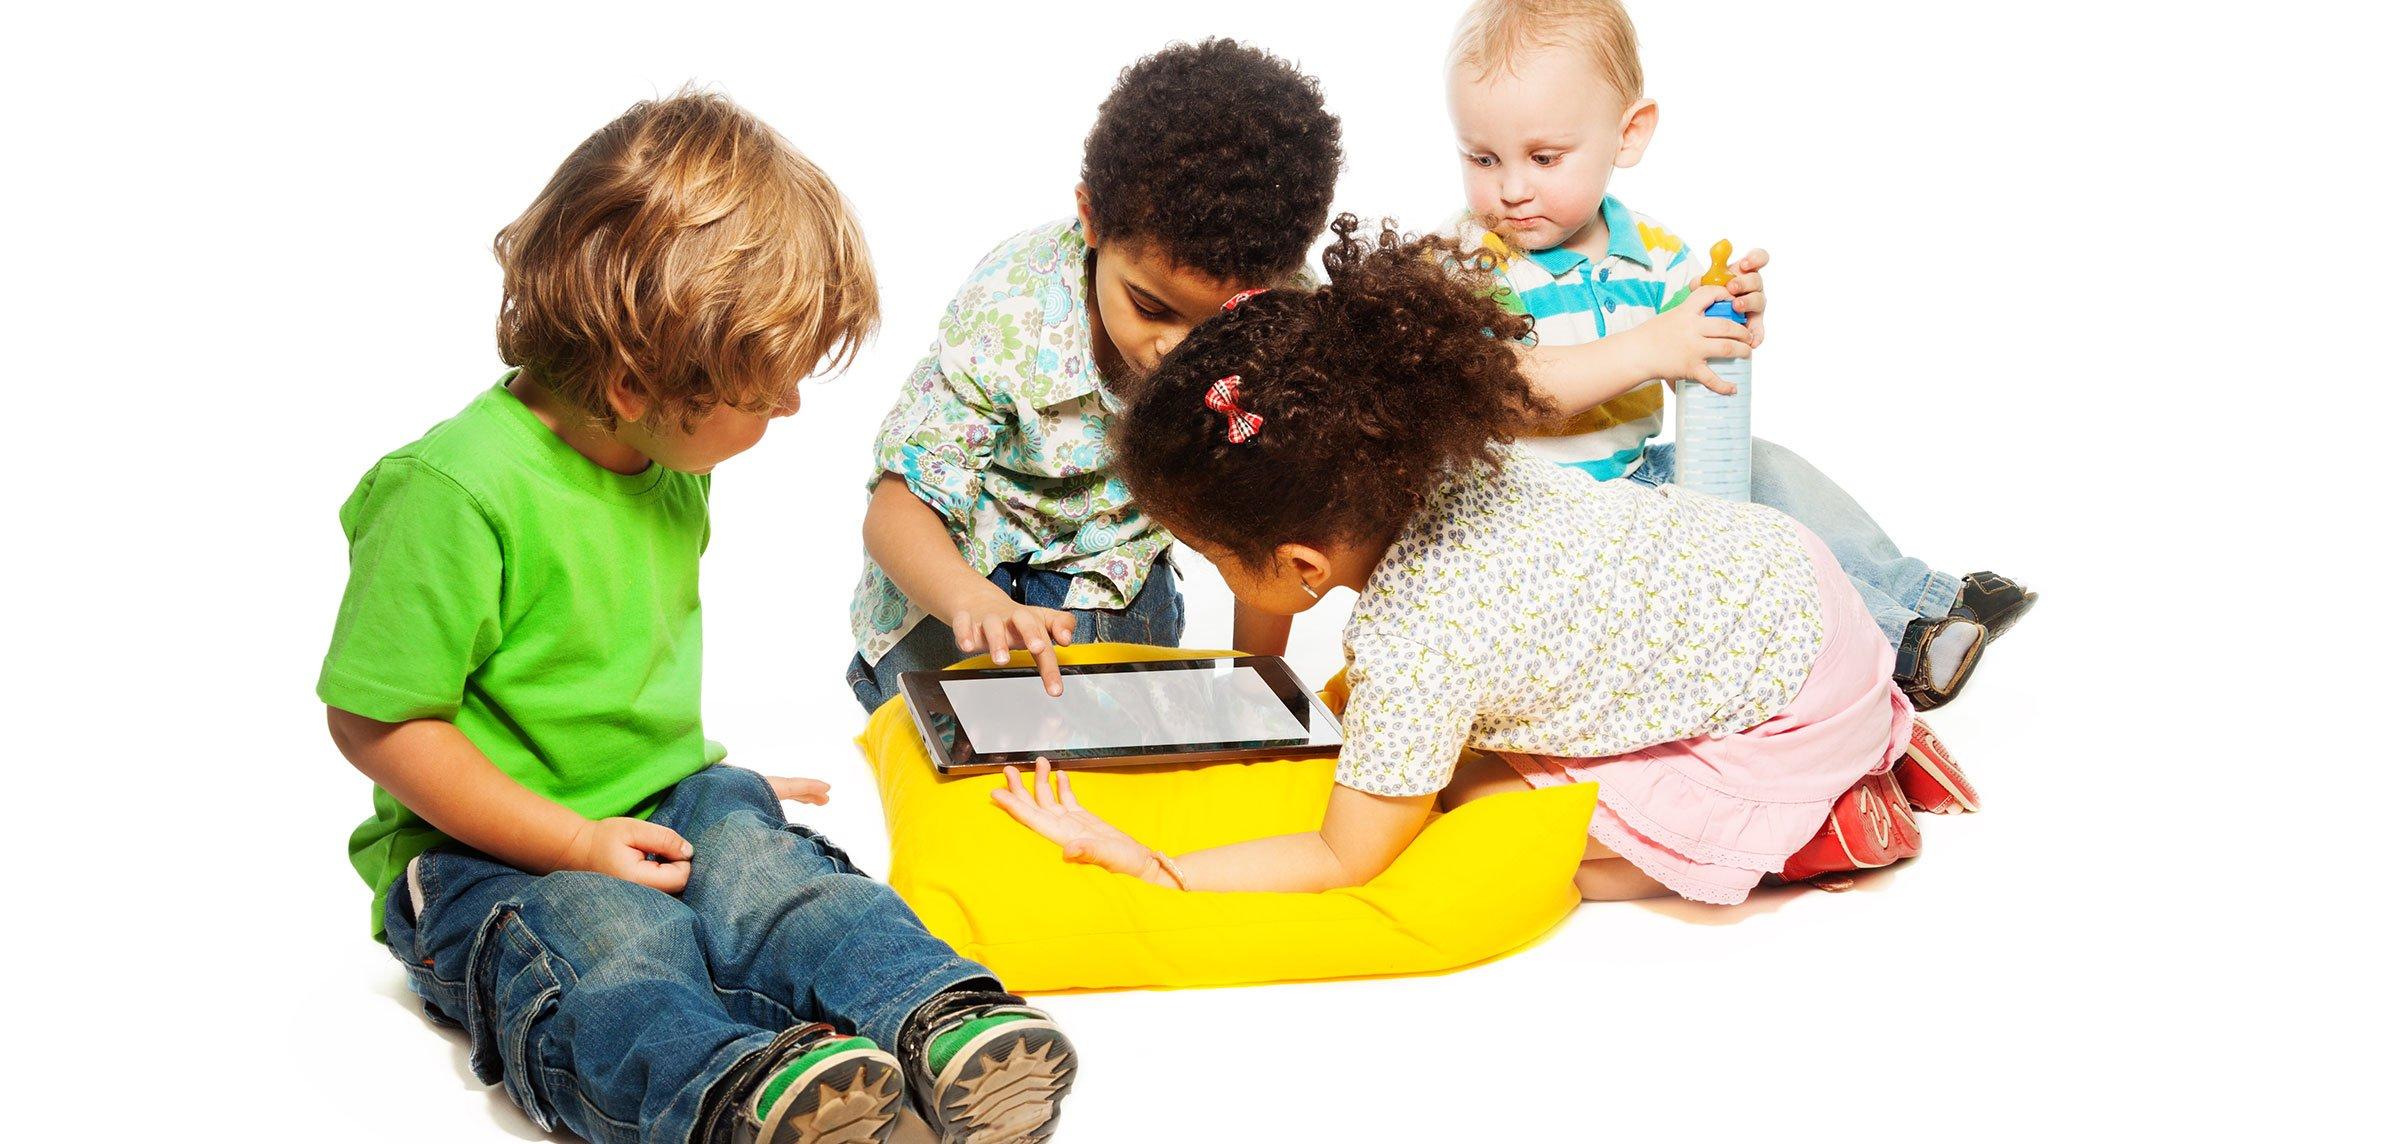 pediatric social skills group